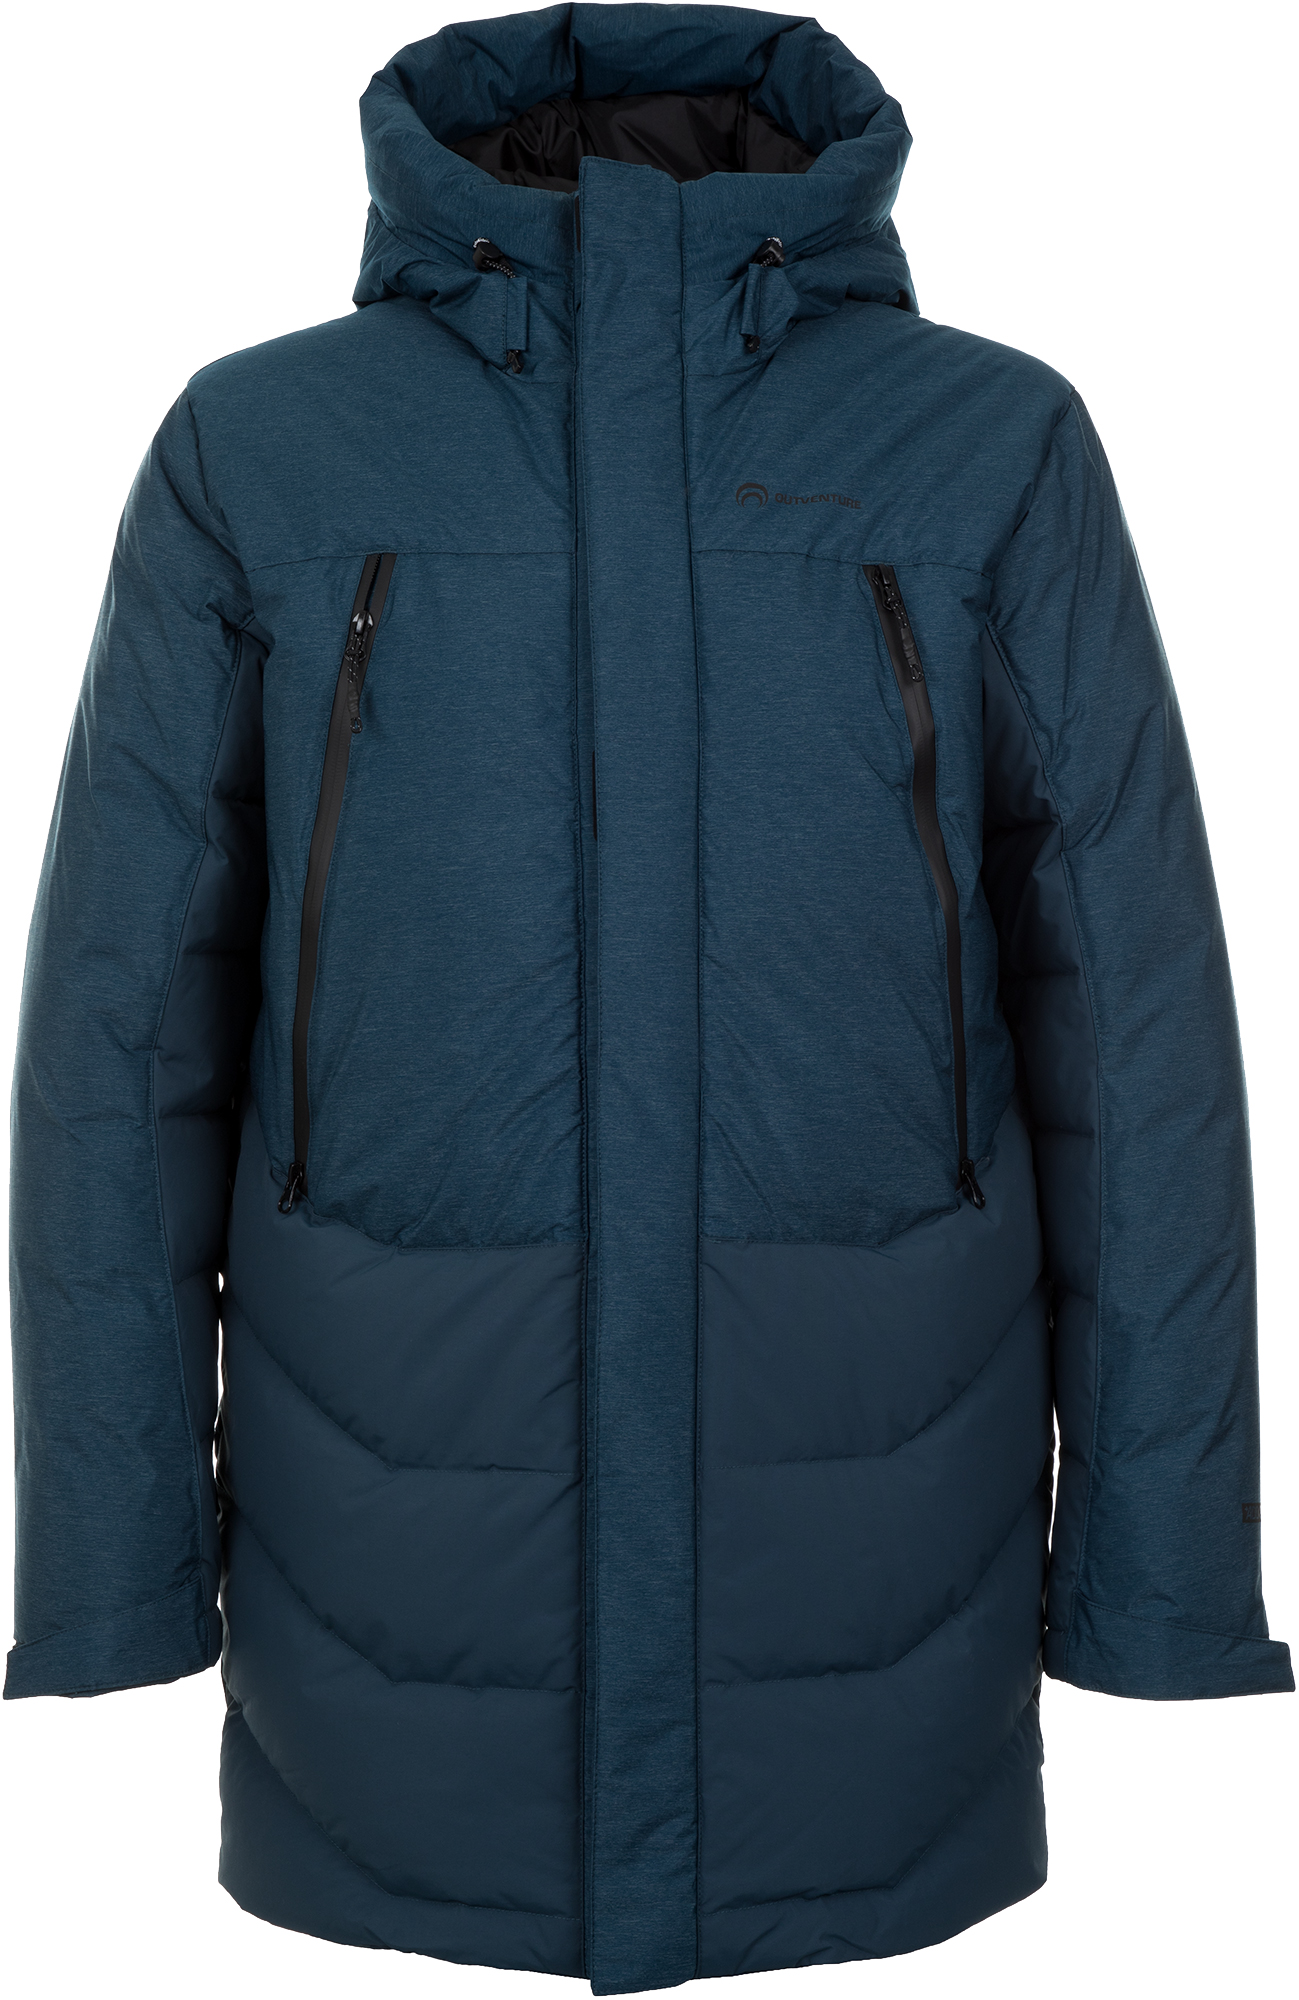 Outventure Куртка пуховая мужская Outventure, размер 58 цена и фото